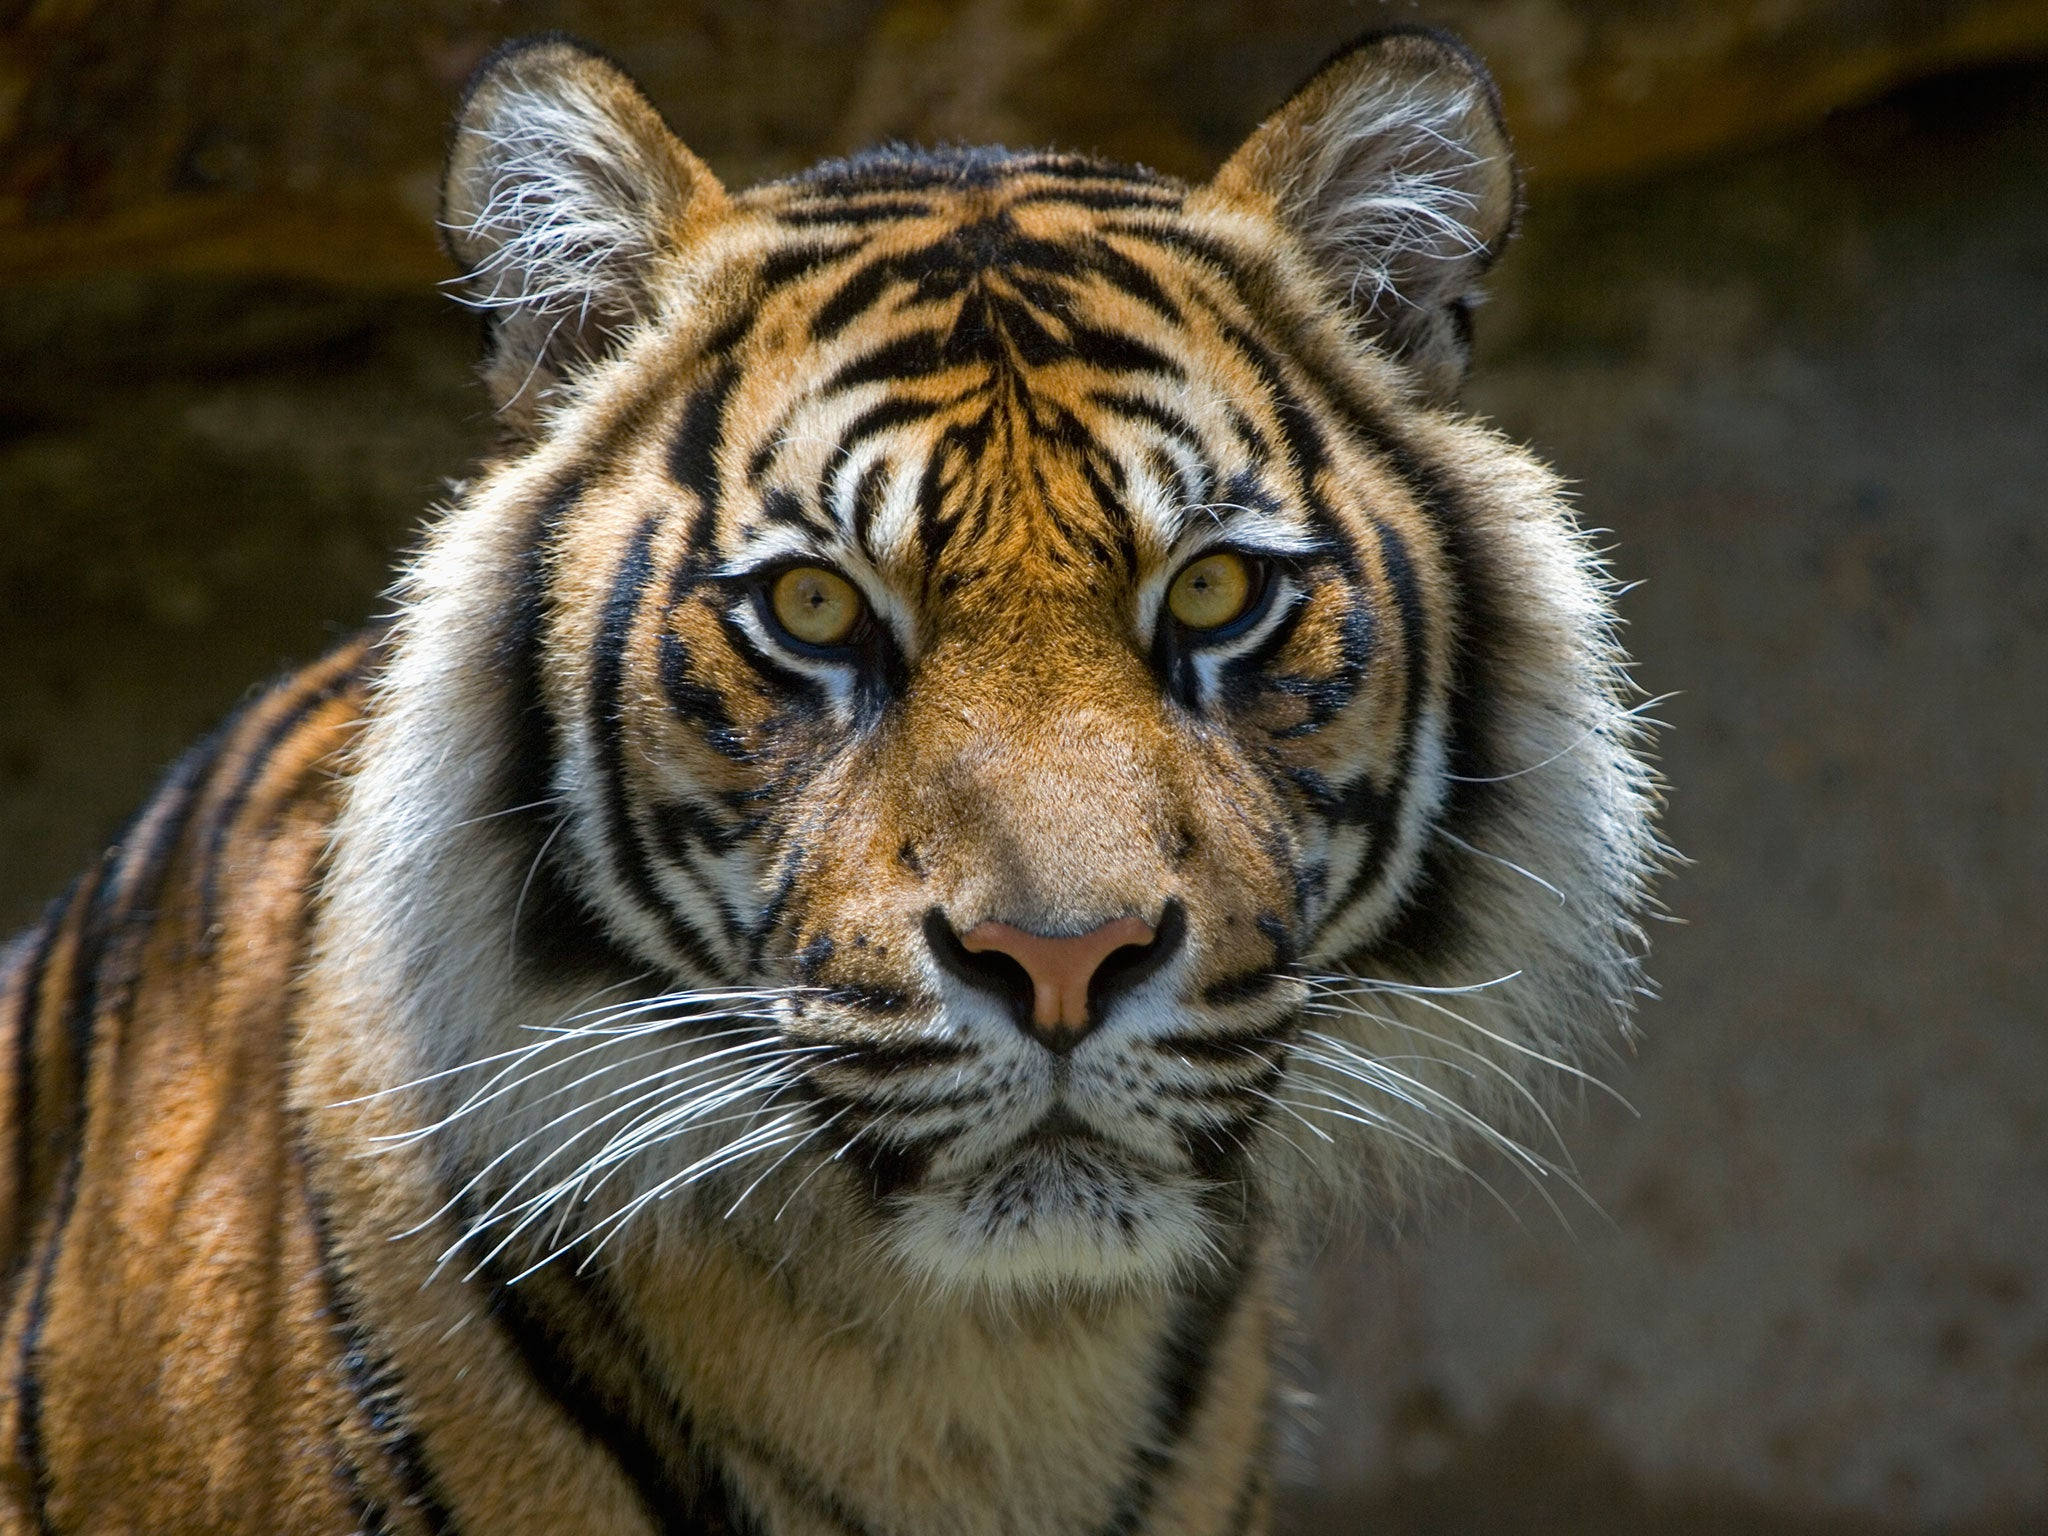 tiger - photo #25